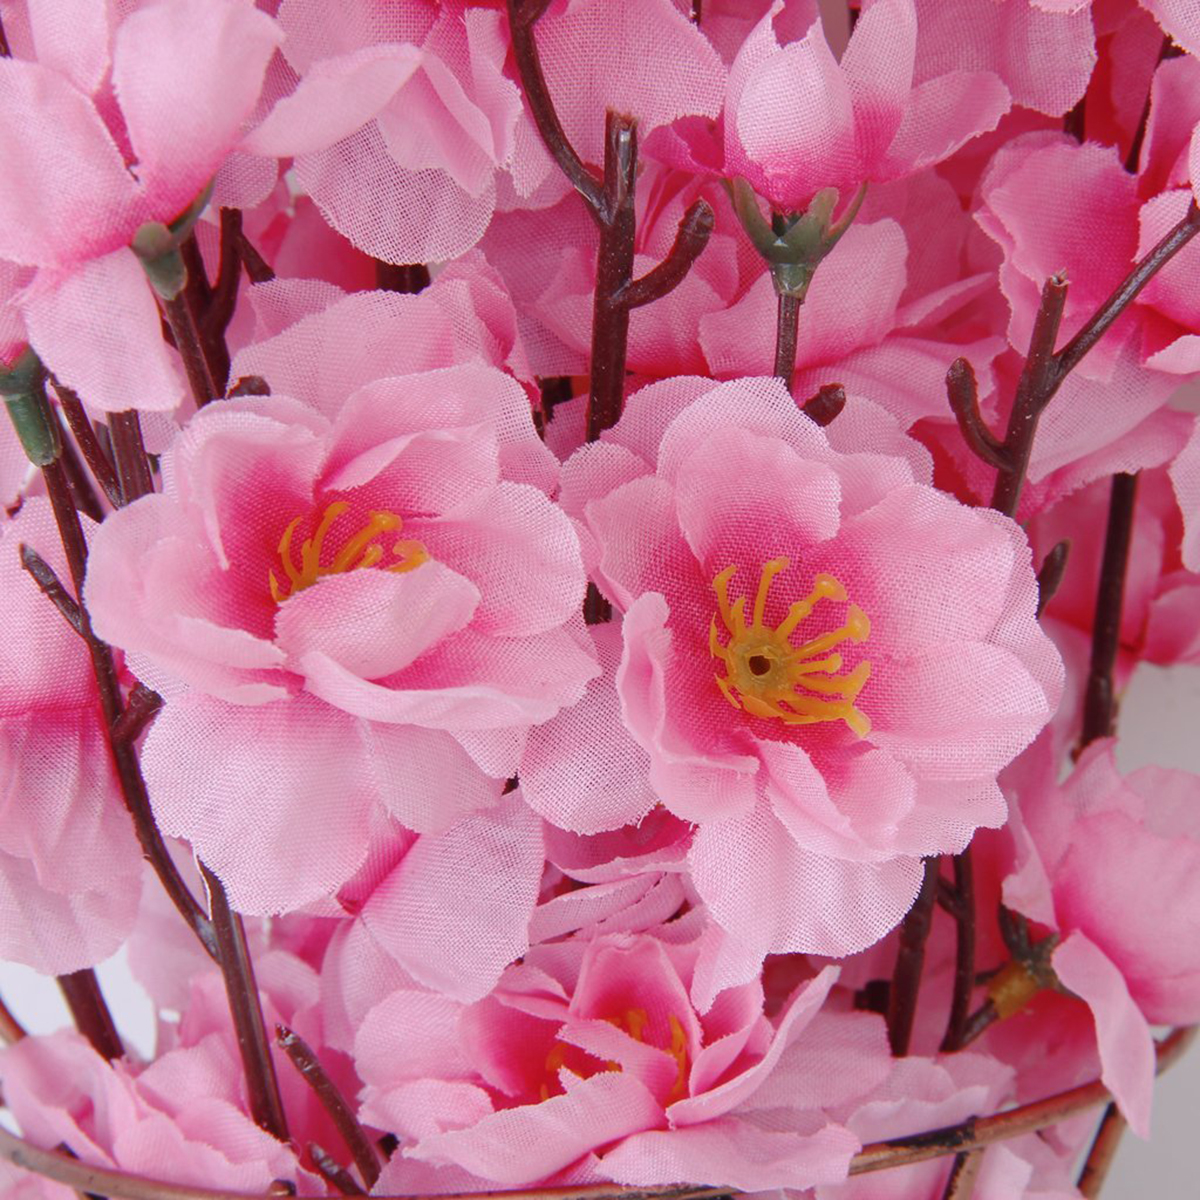 6st persika blomma simulering blommor konstgjorda blommor siden - Semester och fester - Foto 6